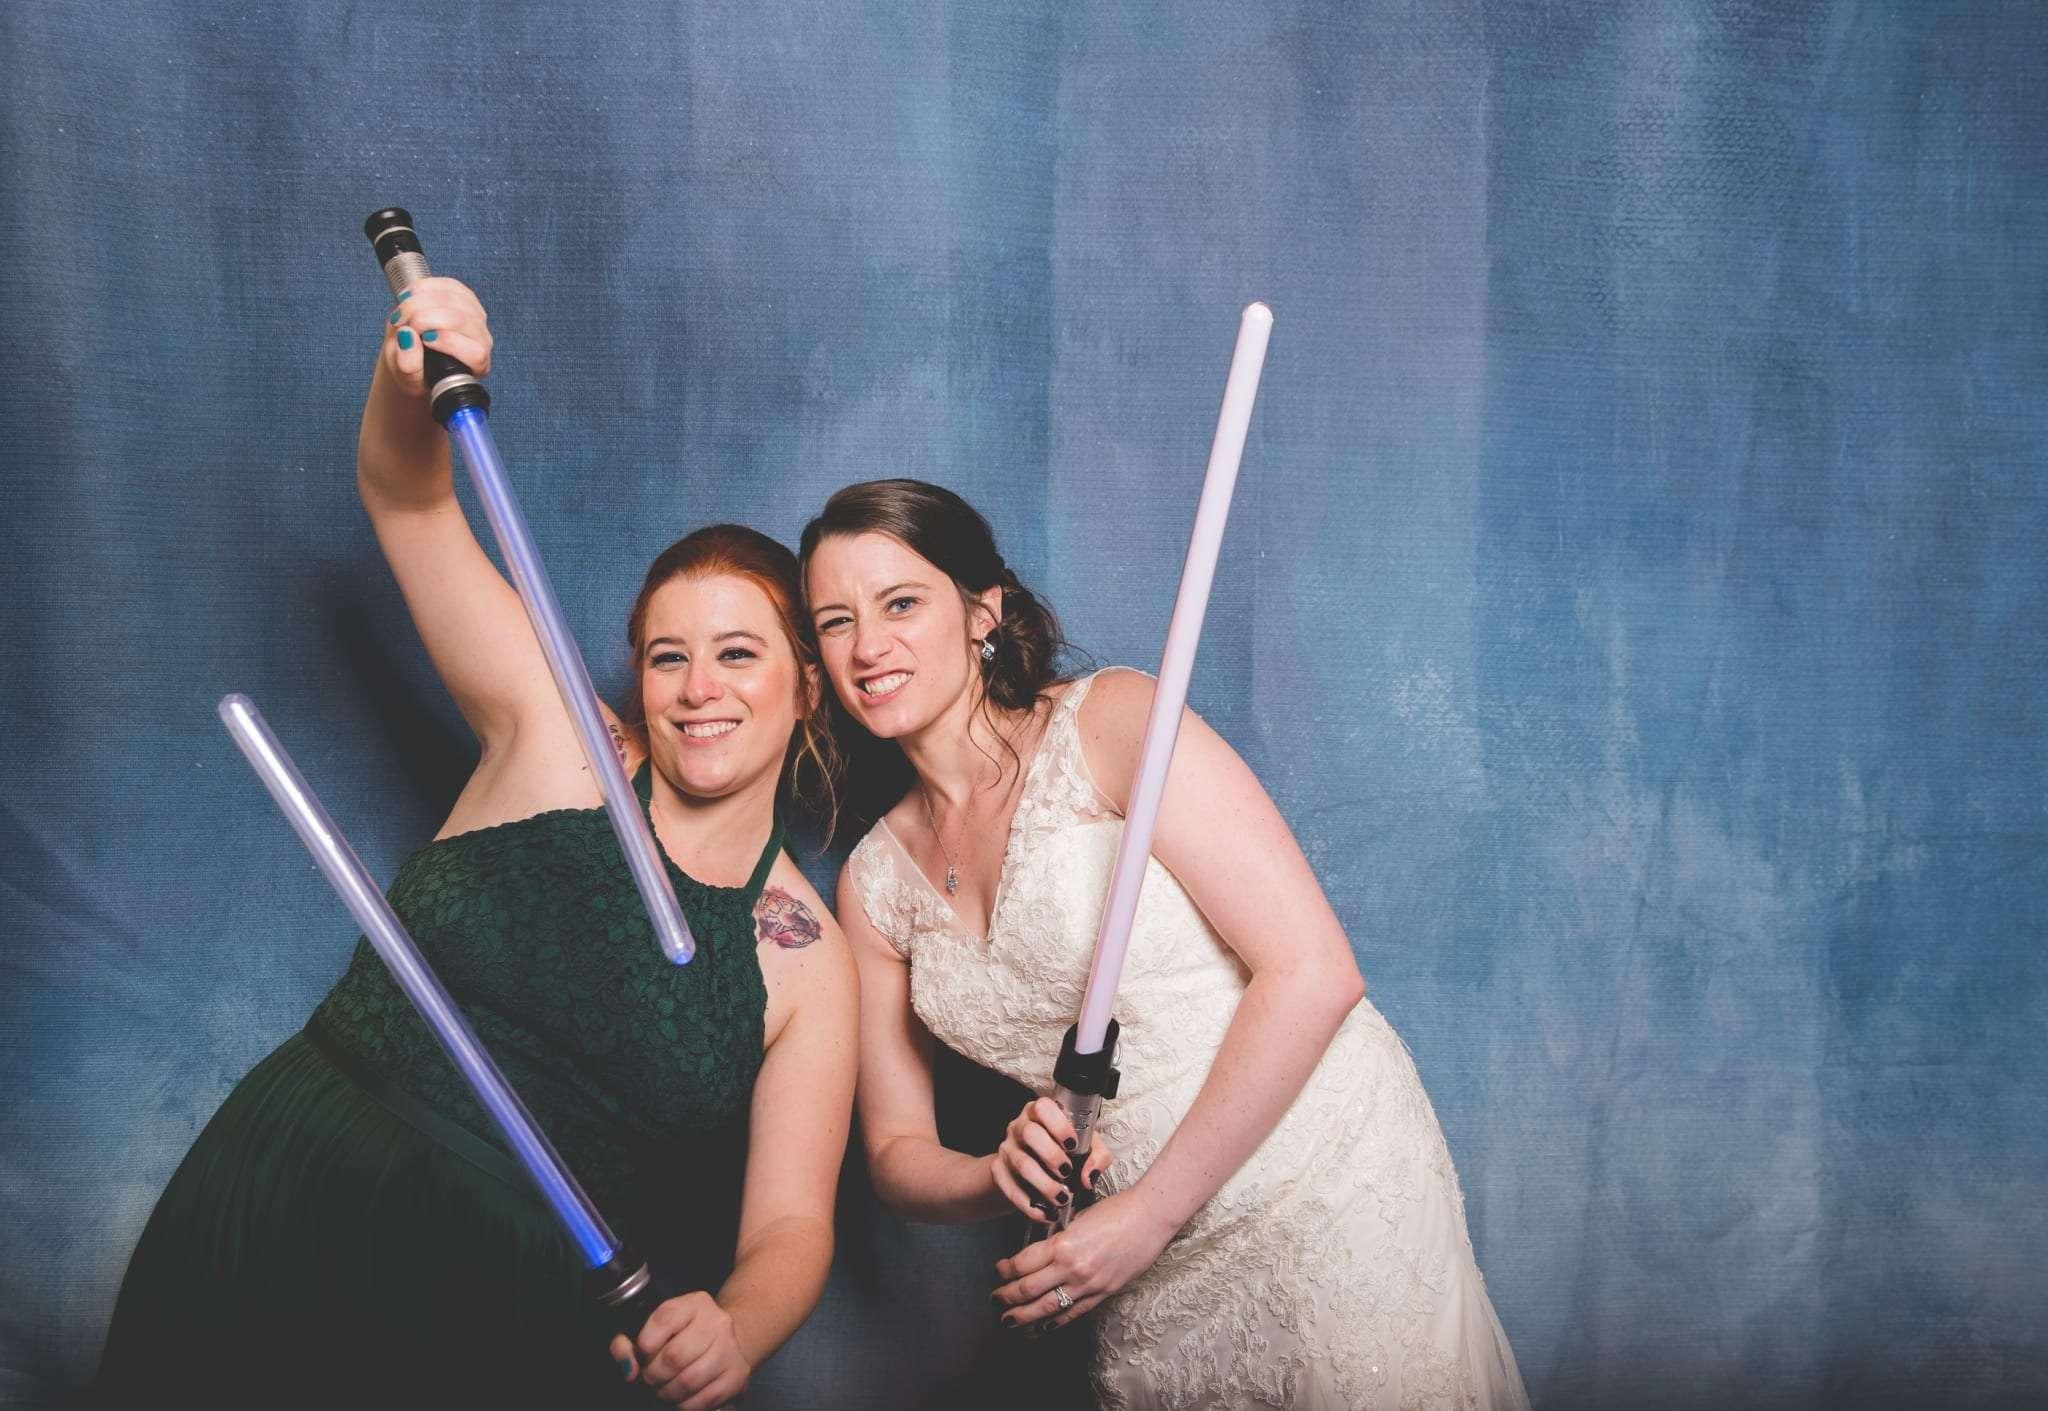 Star Wars Theme Wedding at Mendenhall Inn